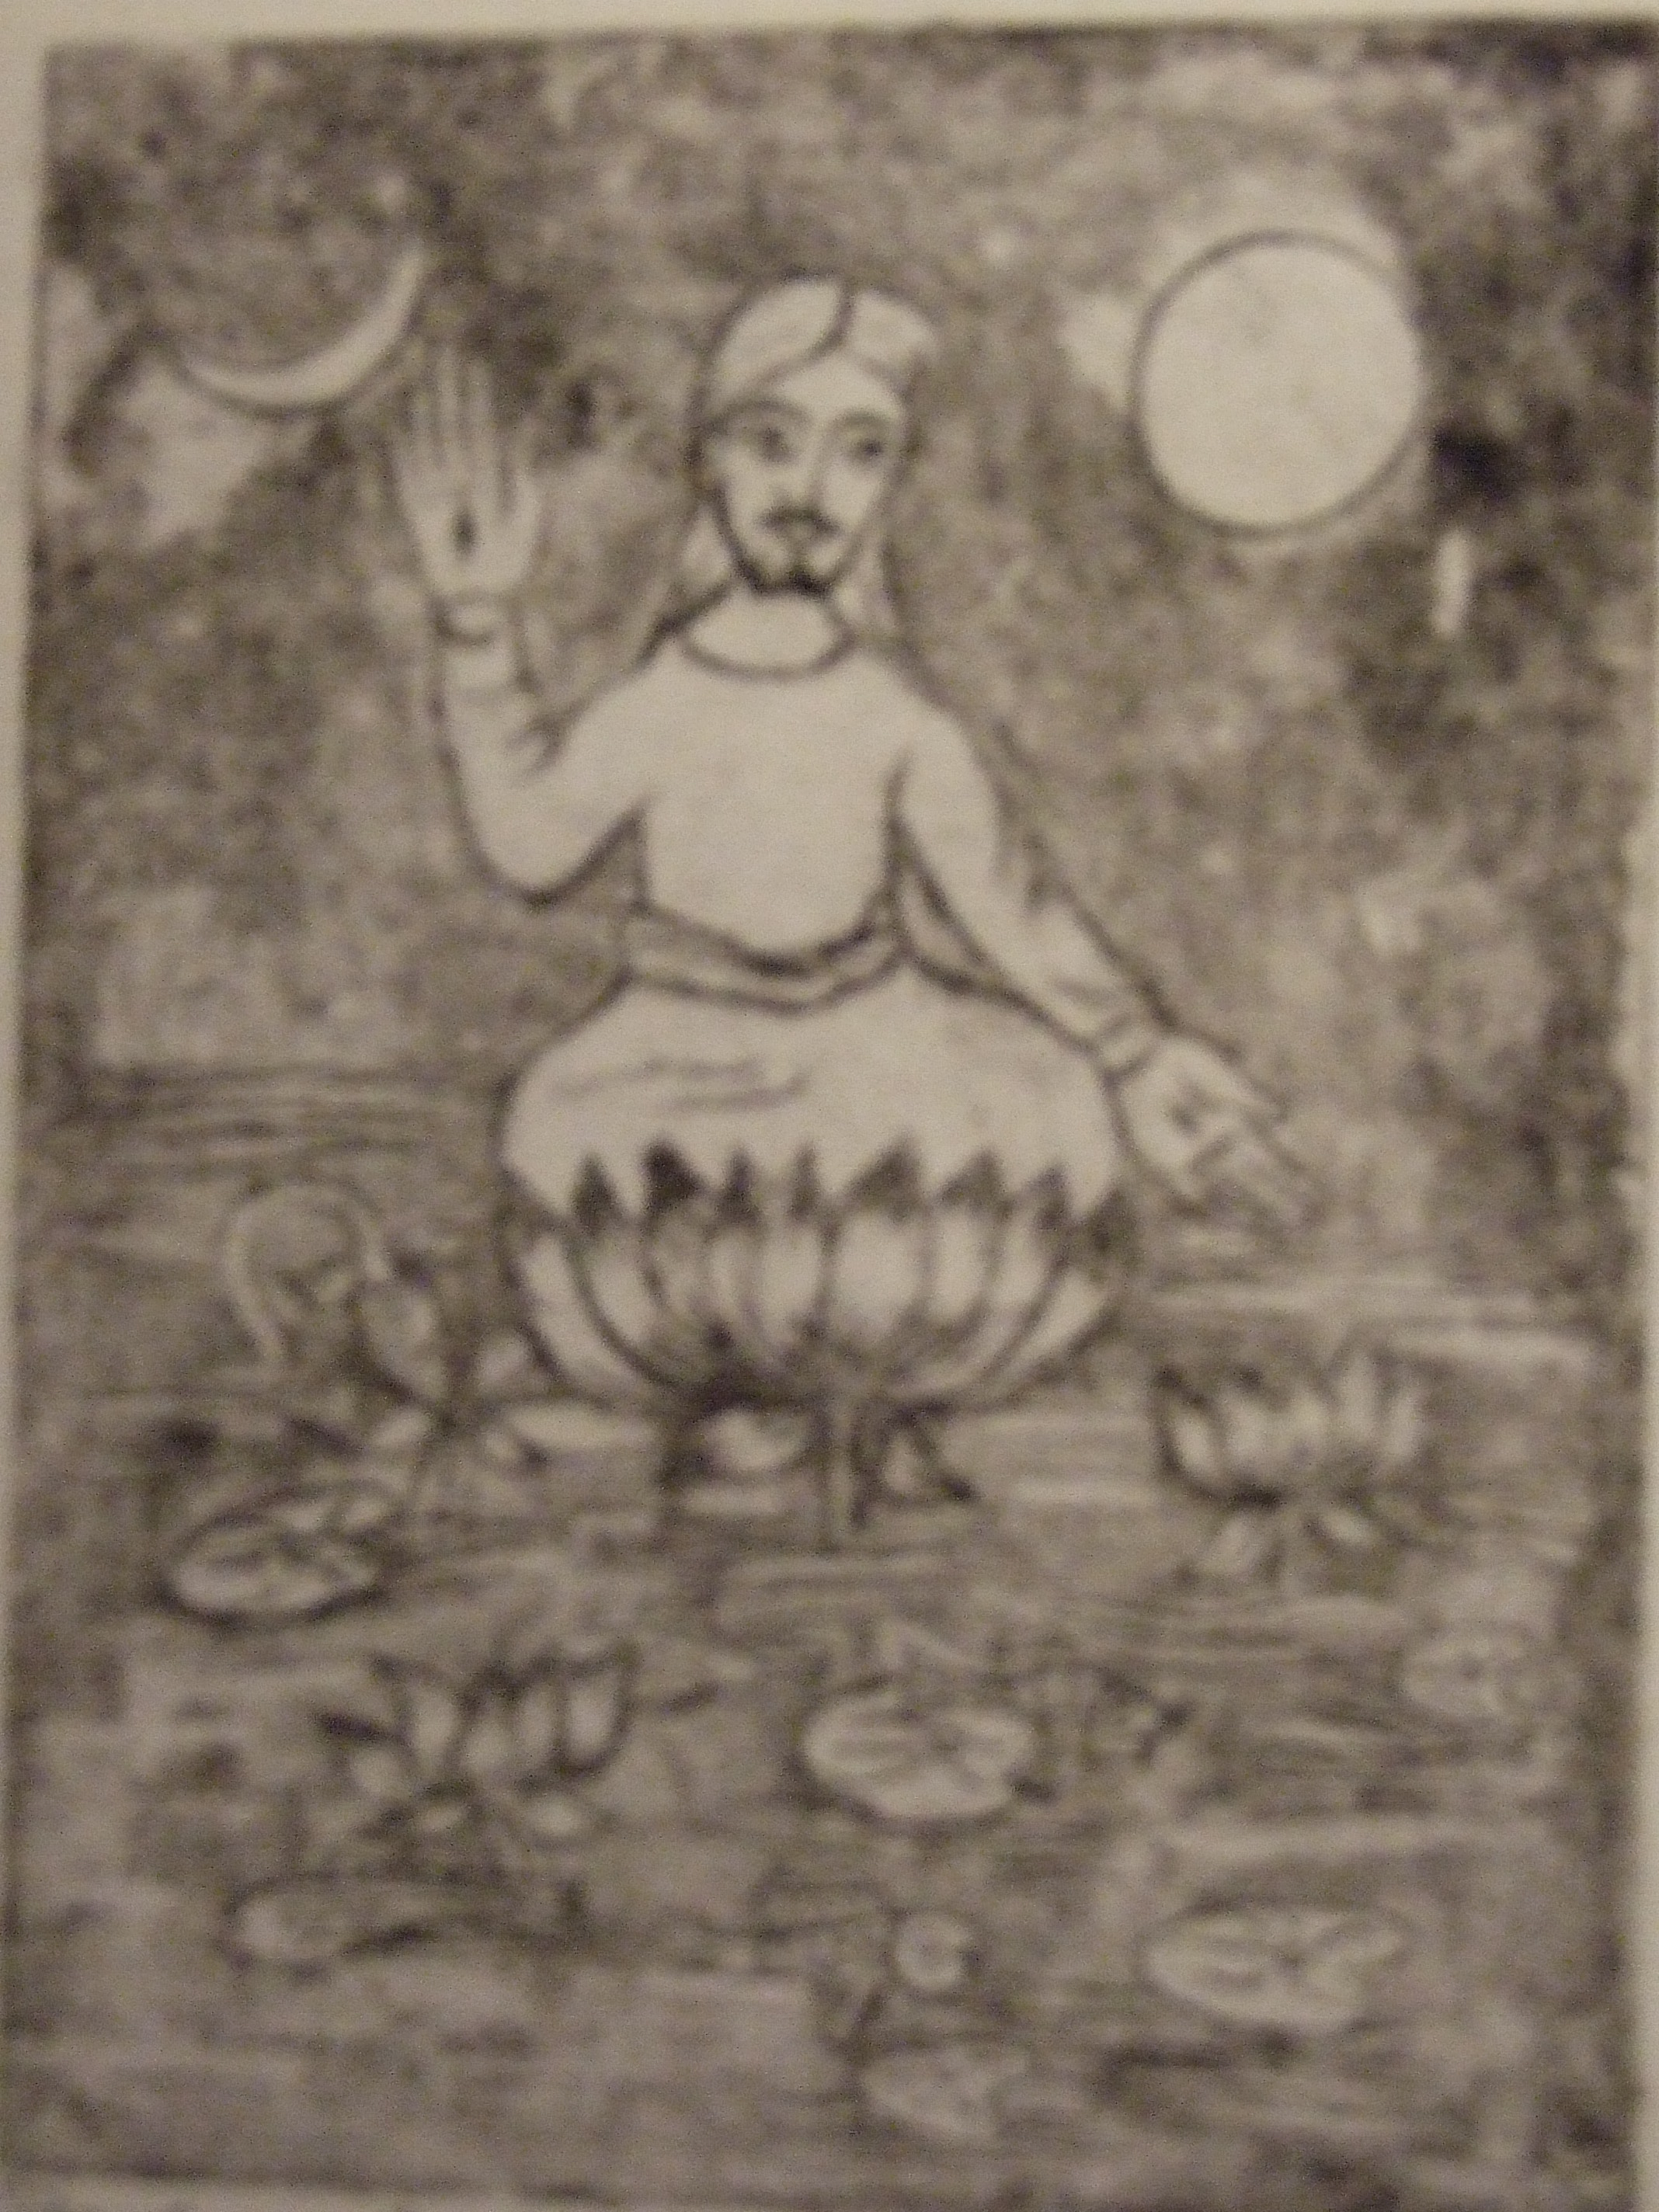 Opgestane Jezus in Lotushouding